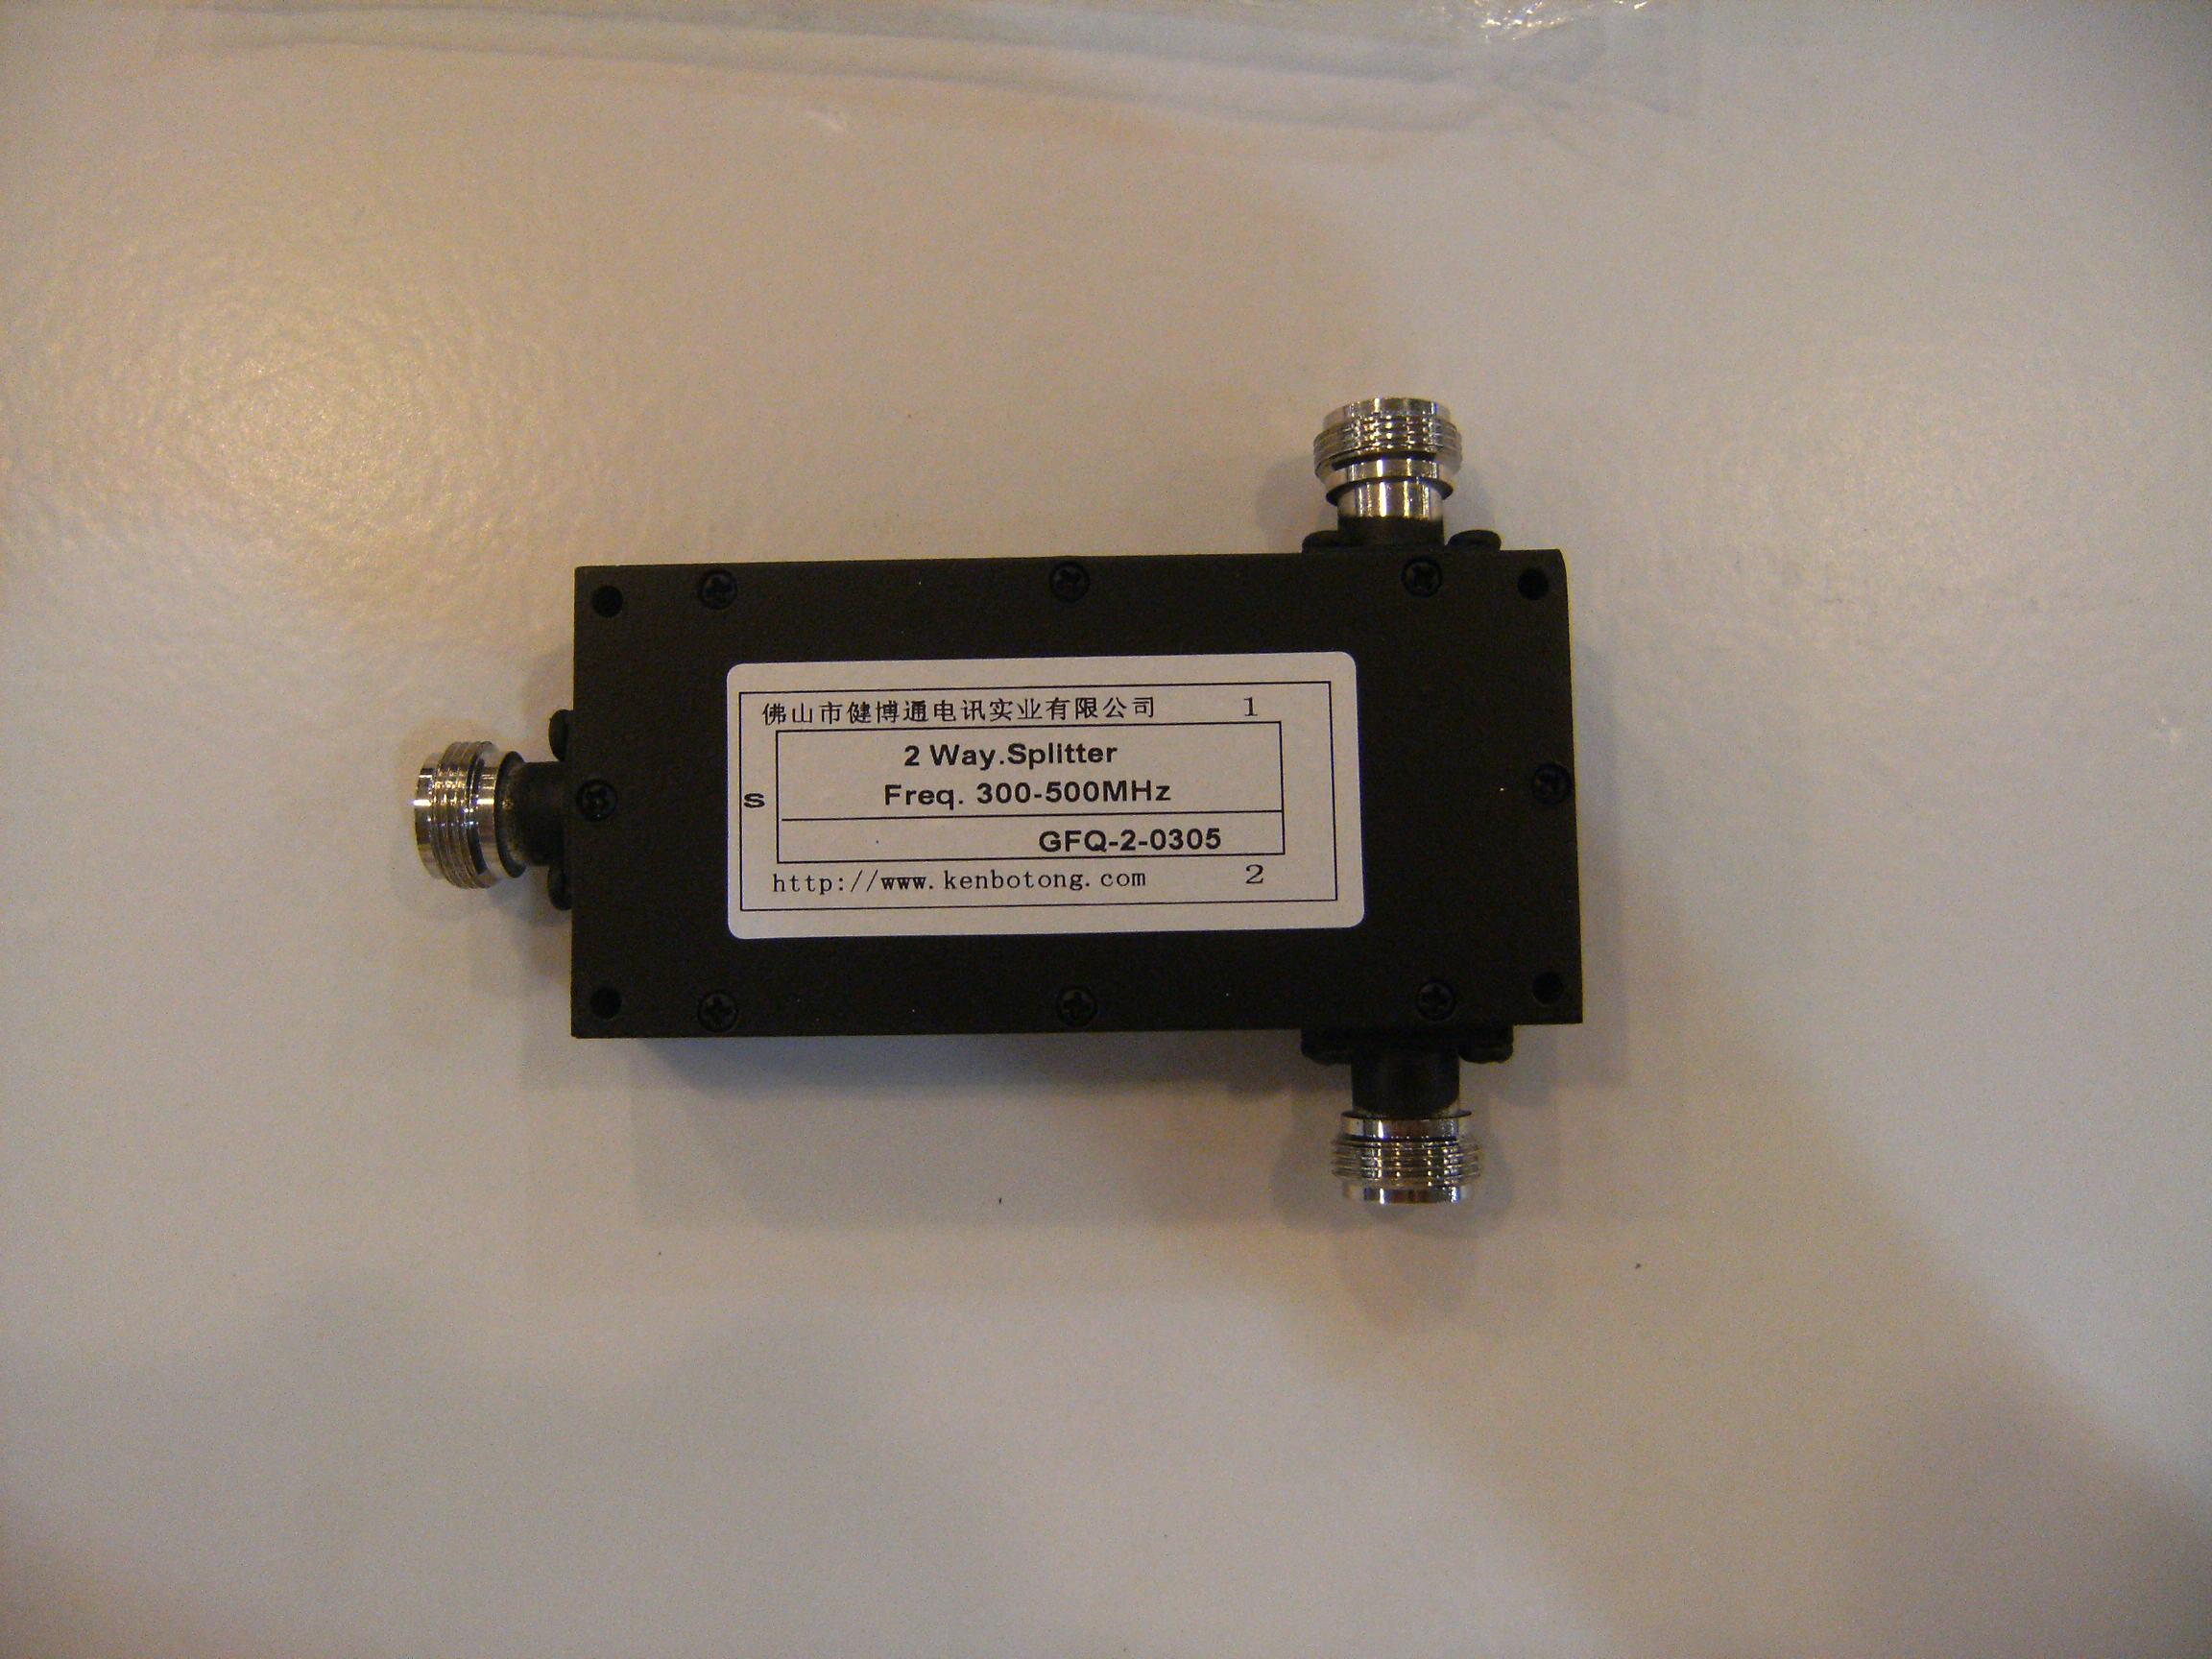 (350-500MHZ) 400MHZ/433MHZ/460 Microstrip Two Power Divider GFQ-2-0305(350-500MHZ) 400MHZ/433MHZ/460 Microstrip Two Power Divider GFQ-2-0305